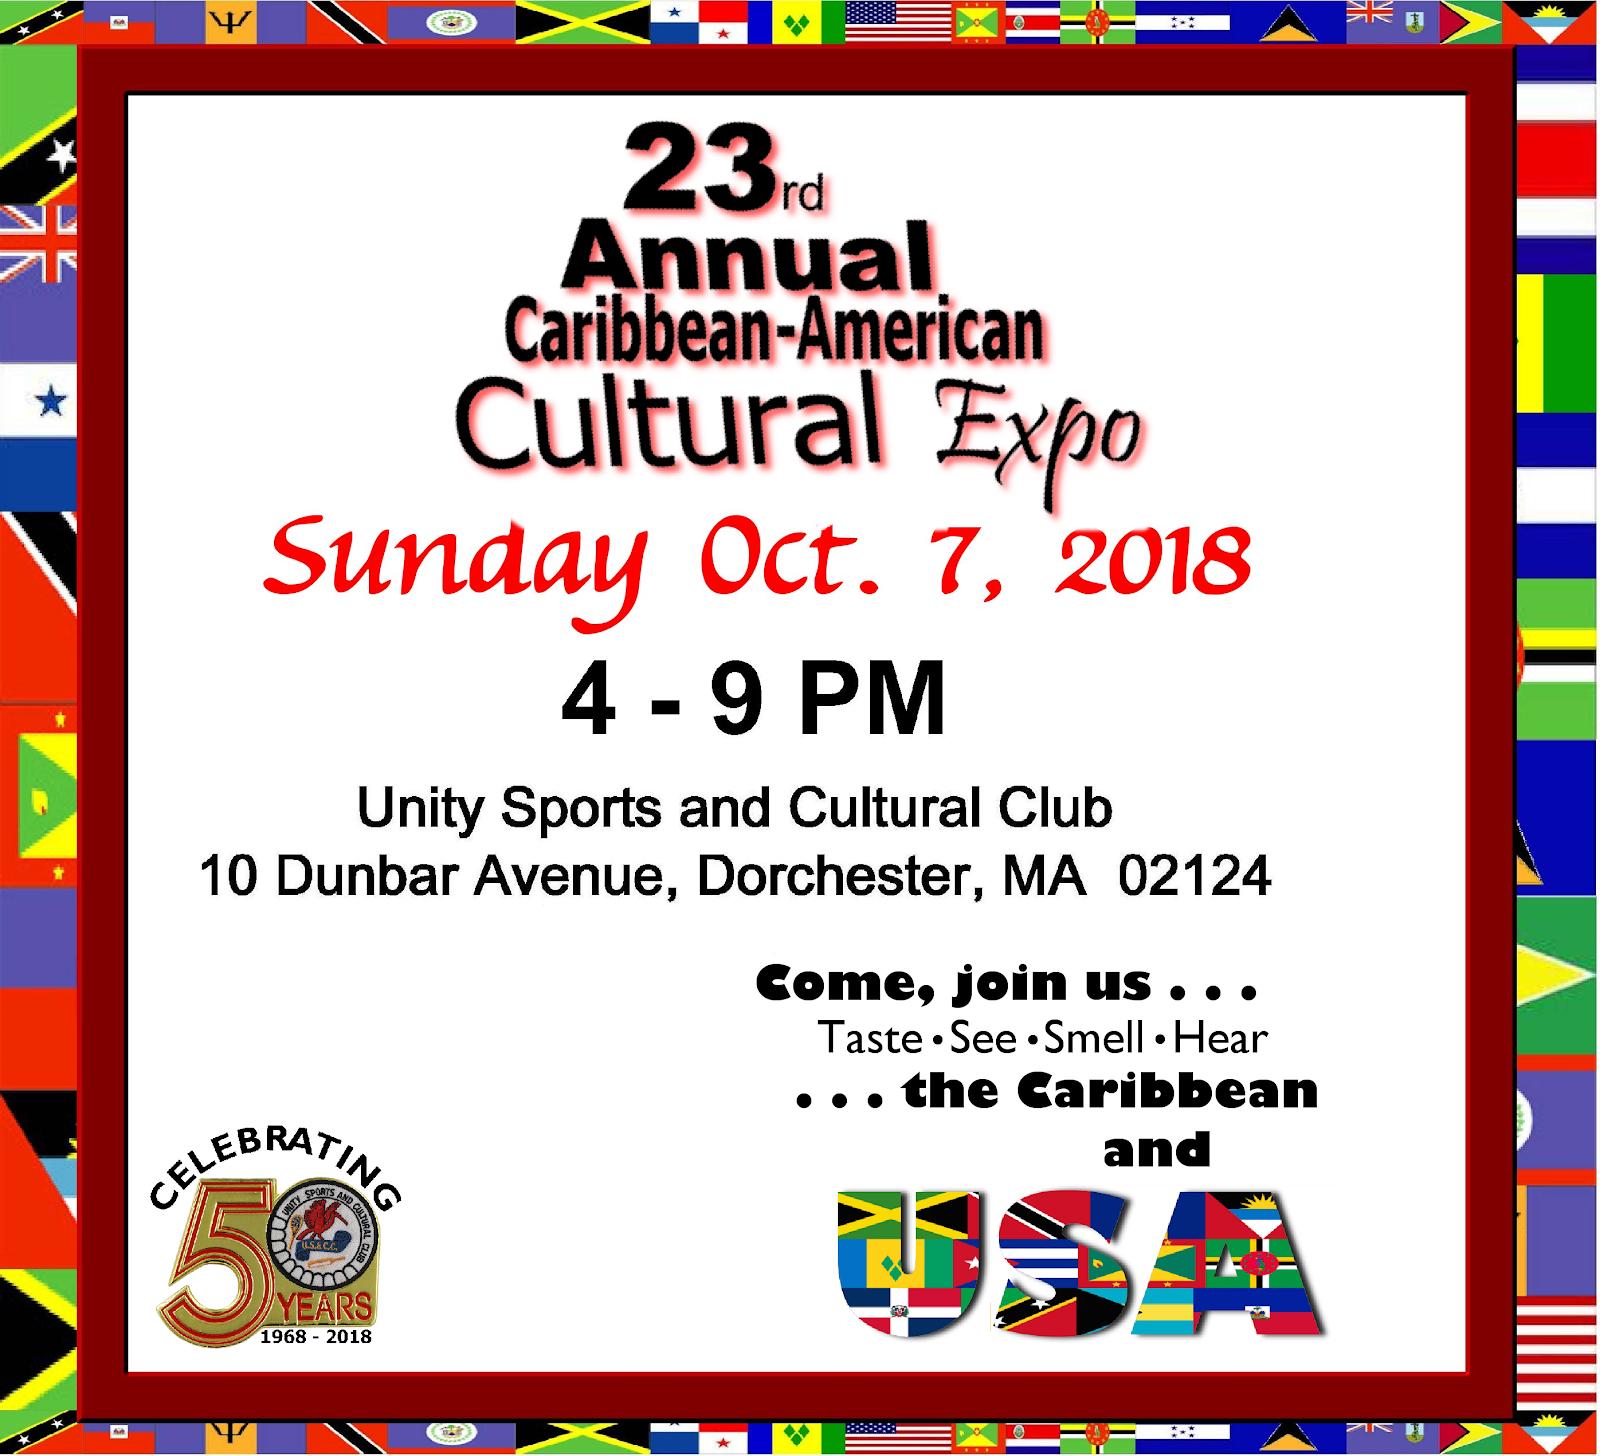 Caribbean-American Cultural Expo